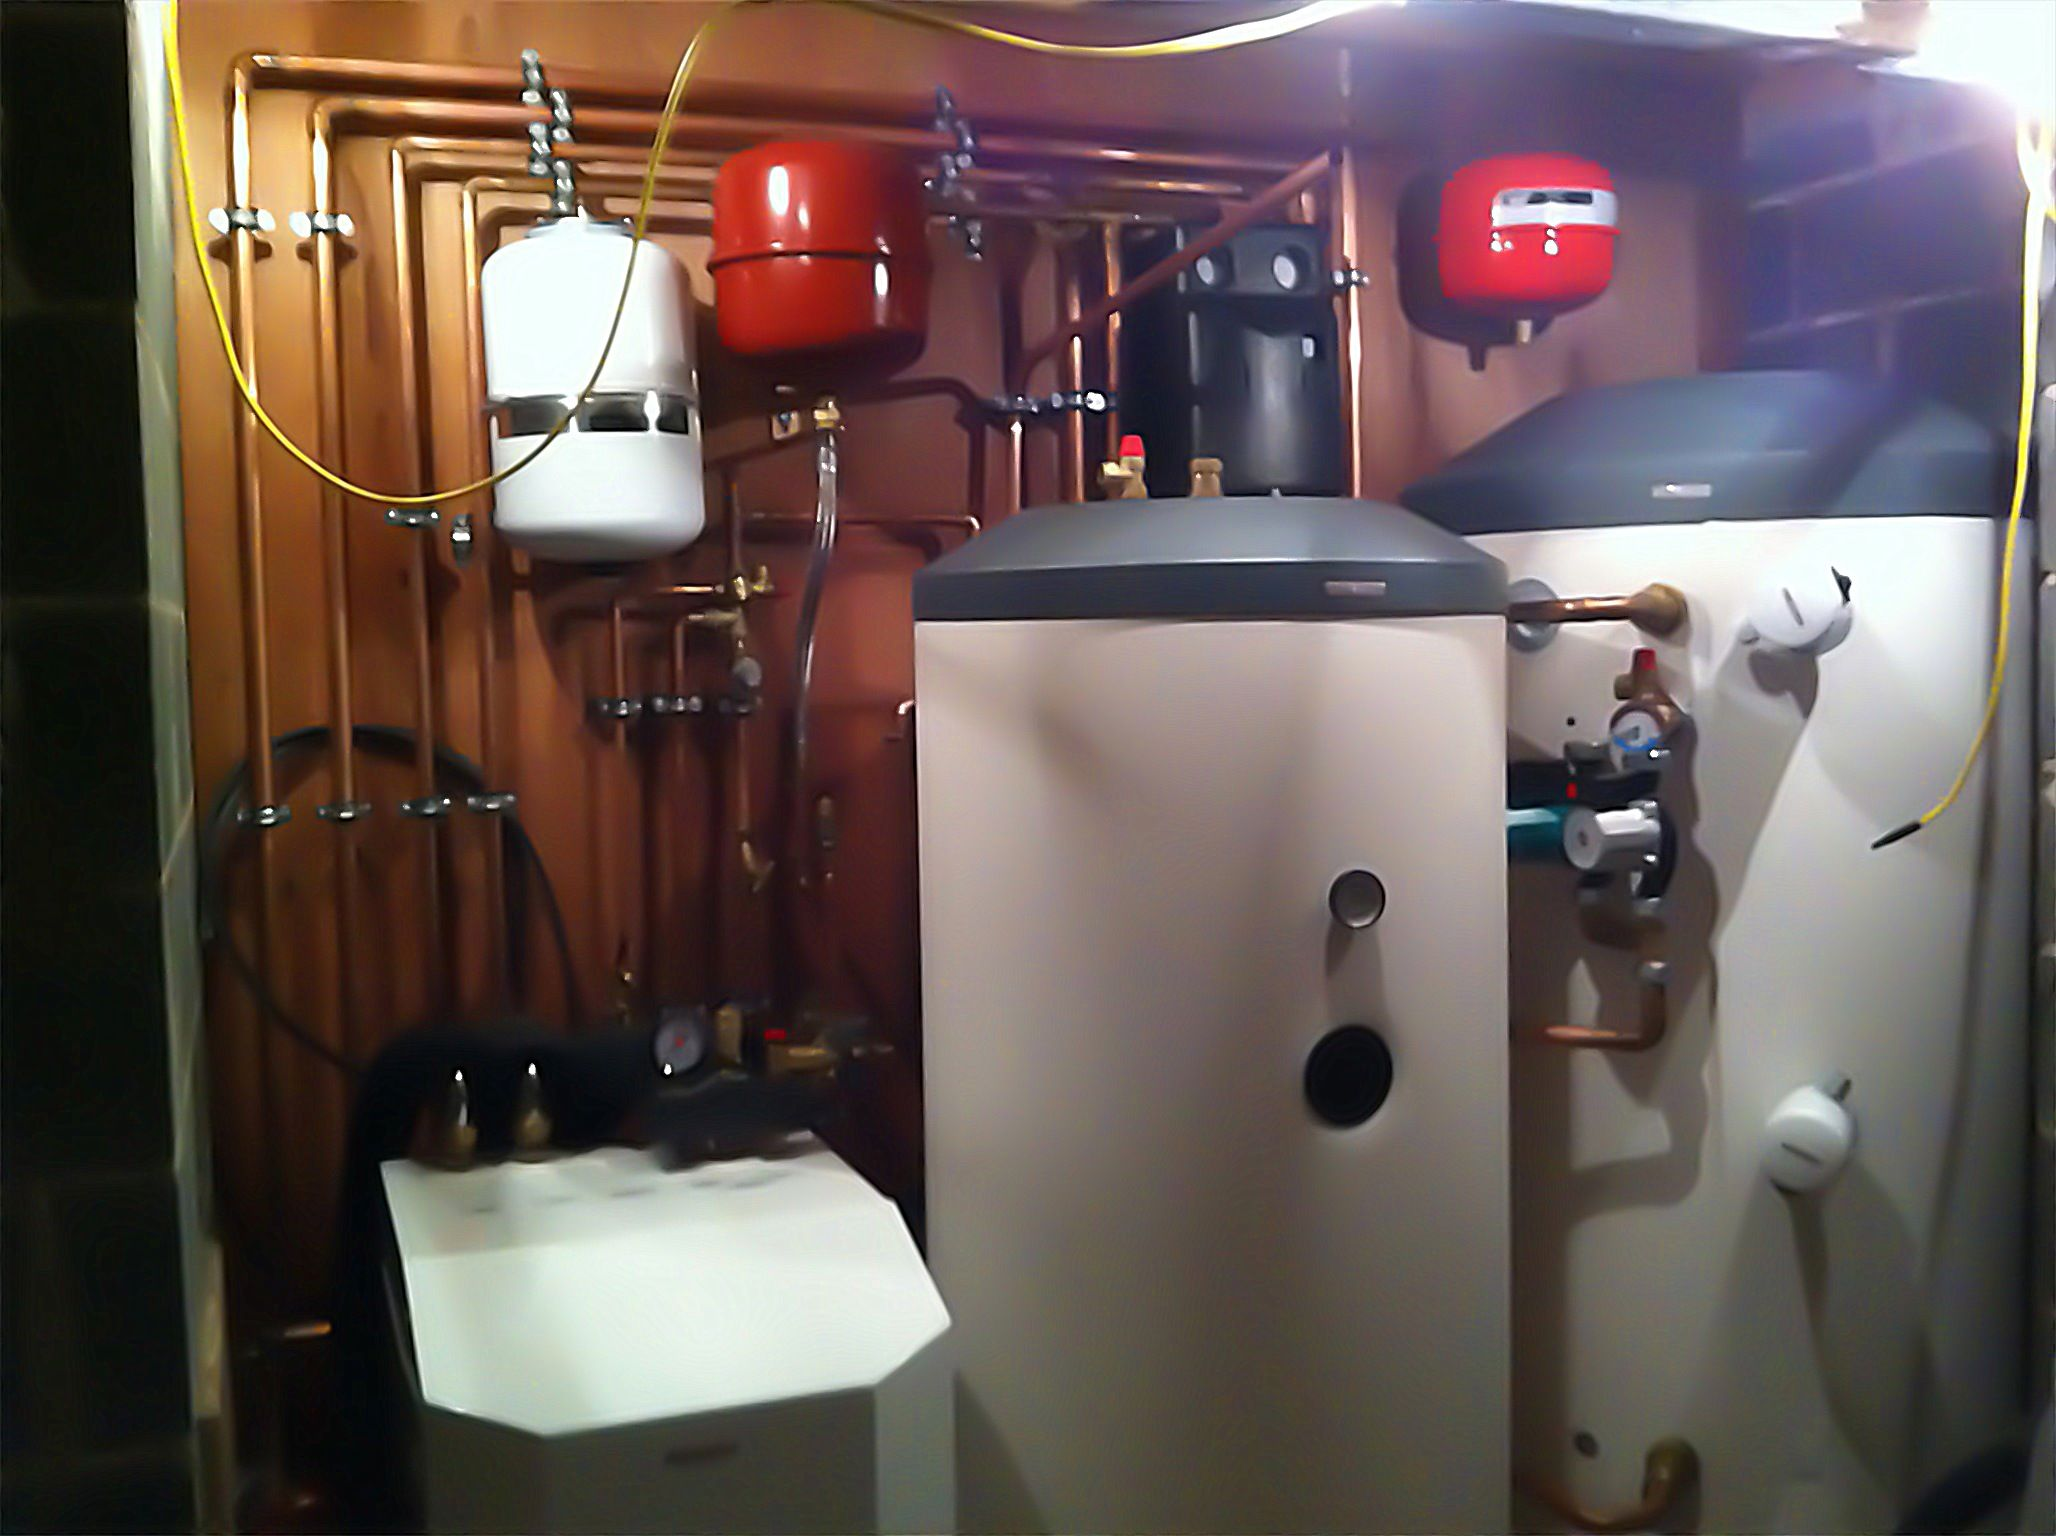 Heated Water Pump Ground Source Heating Plant Room 17kw Heat Pump 500ltr Hot Water